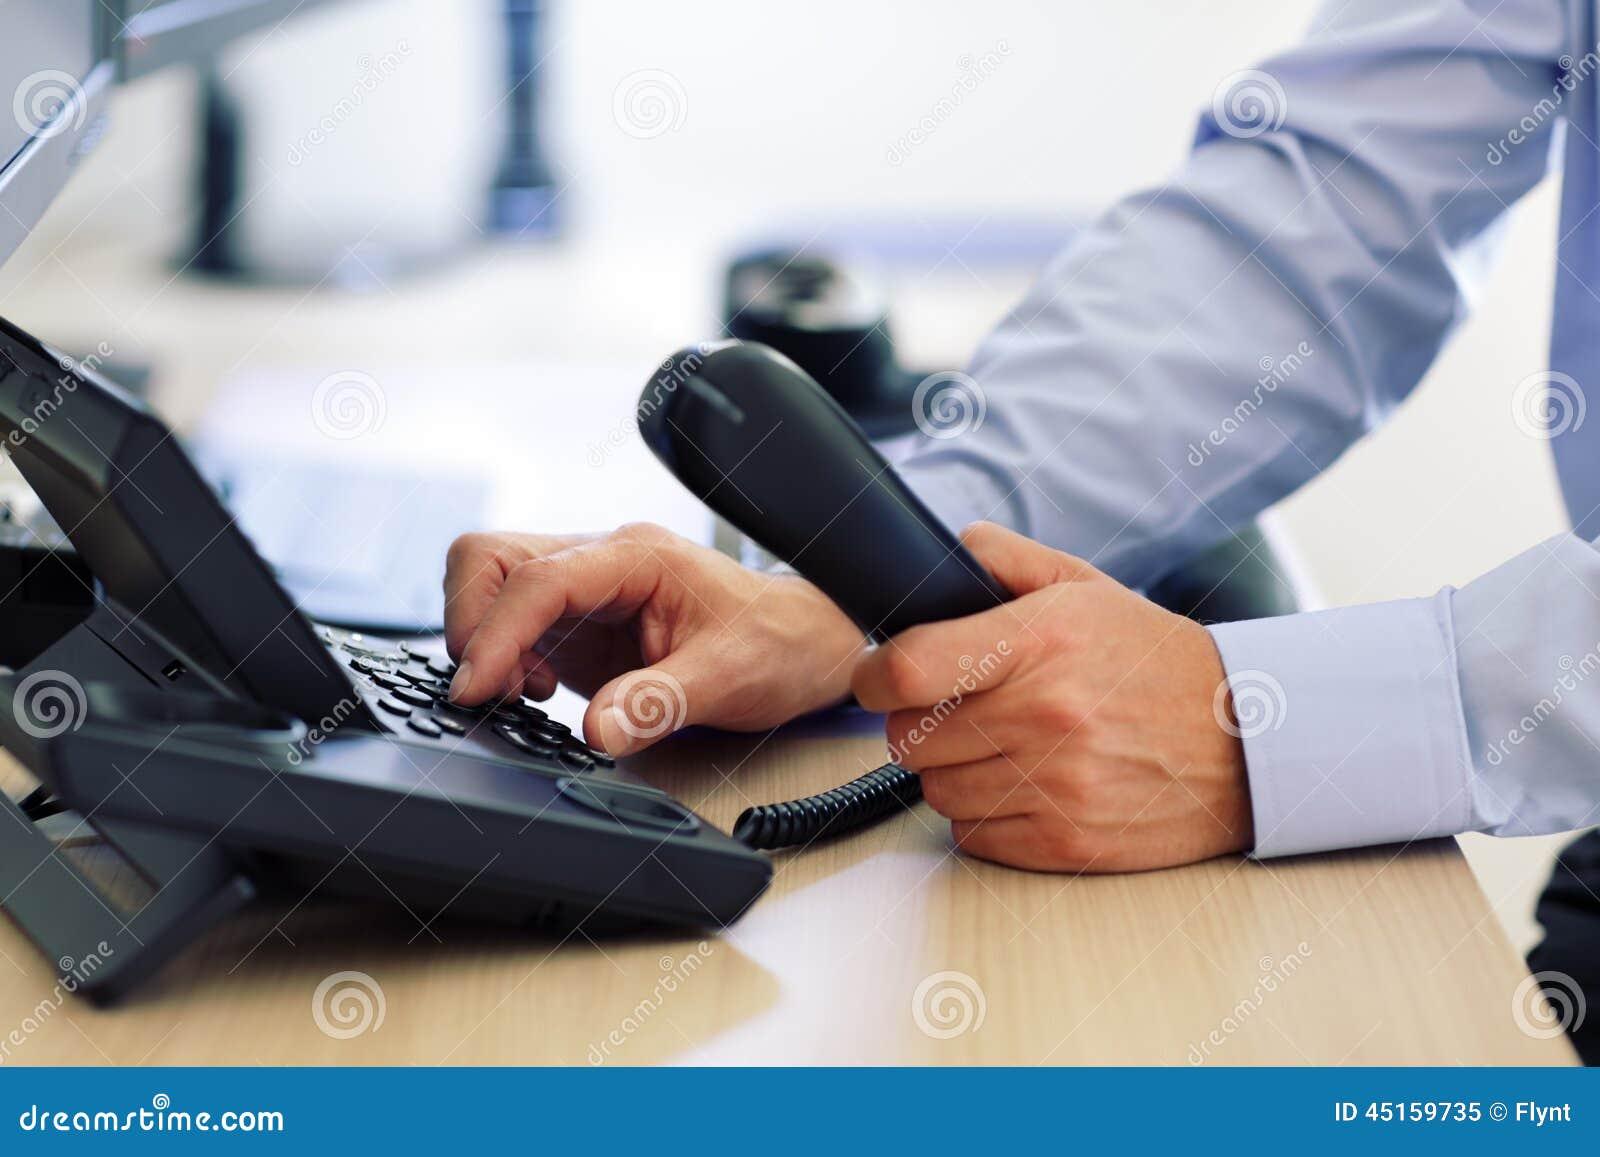 dialing telephone keypad stock photo image 45159735. Black Bedroom Furniture Sets. Home Design Ideas